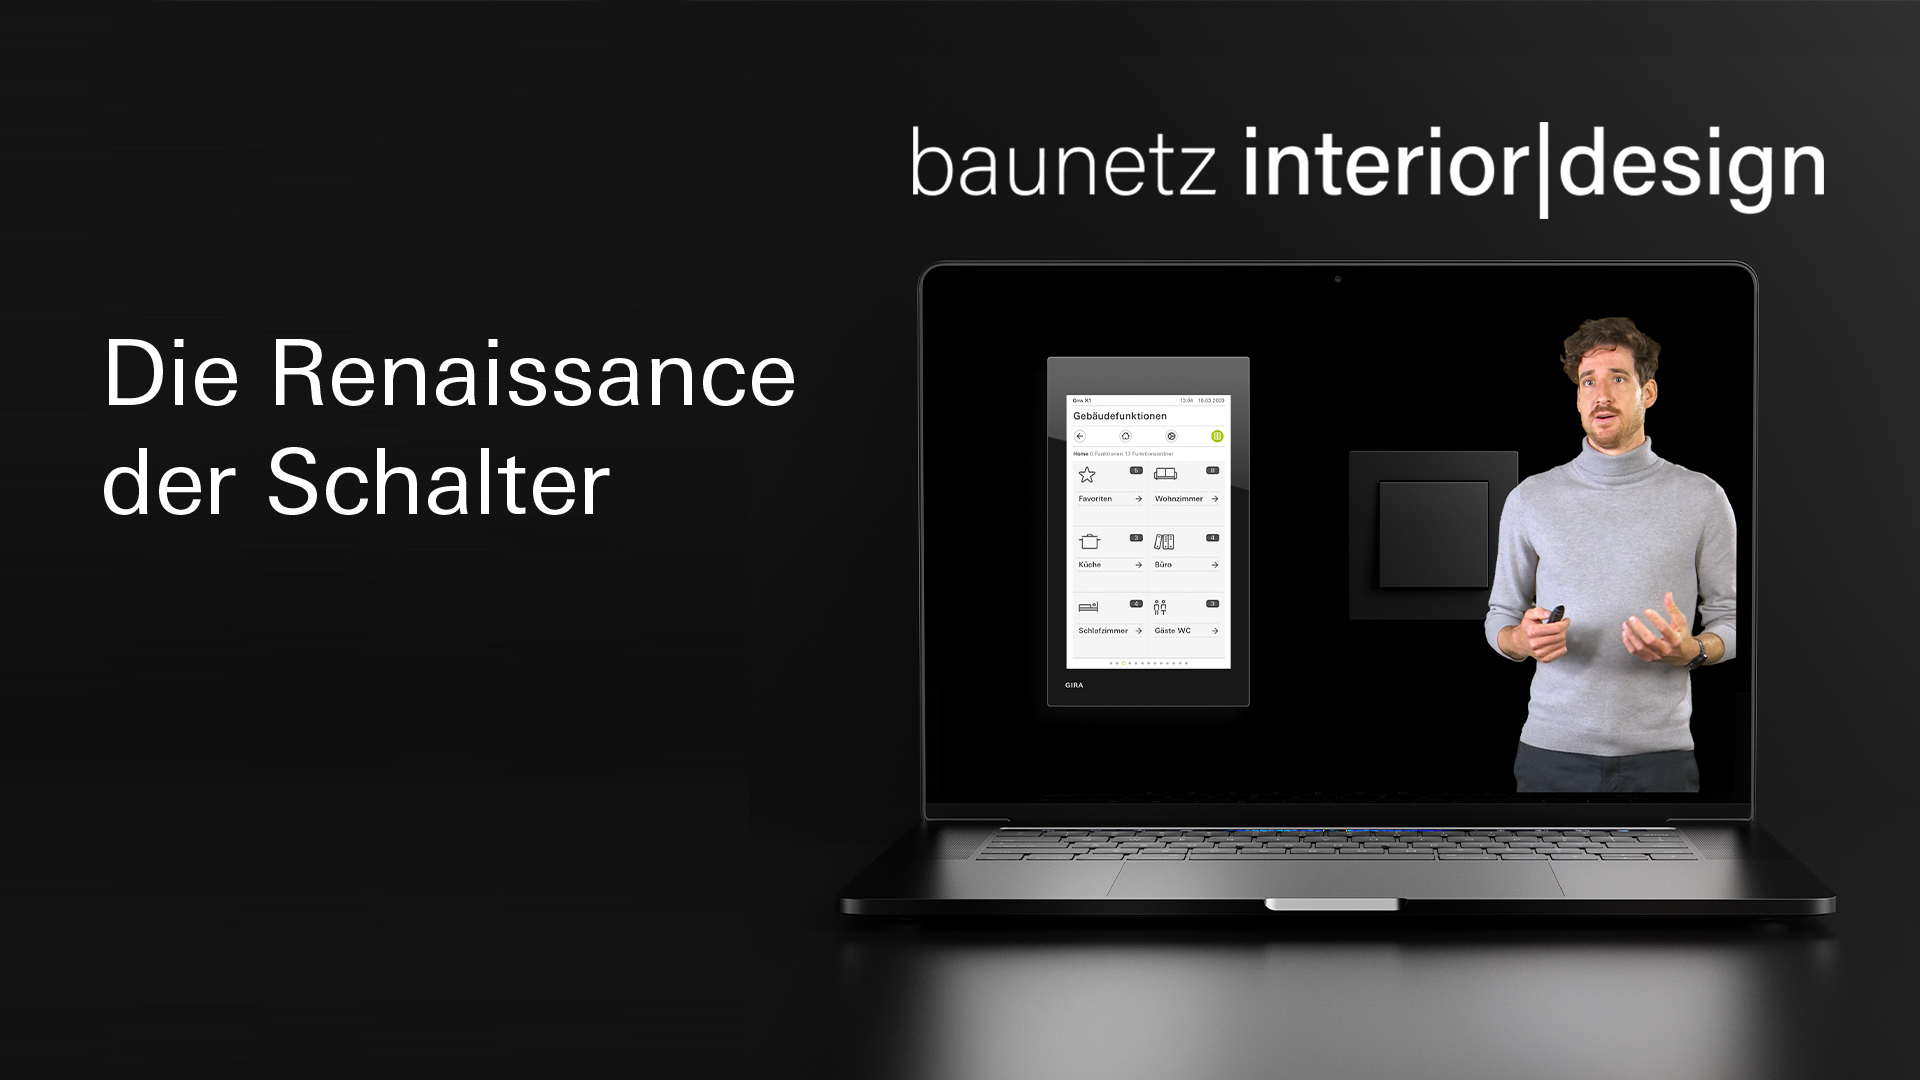 Julian Waning Interview mit baunetz id Renaissance der Schalter